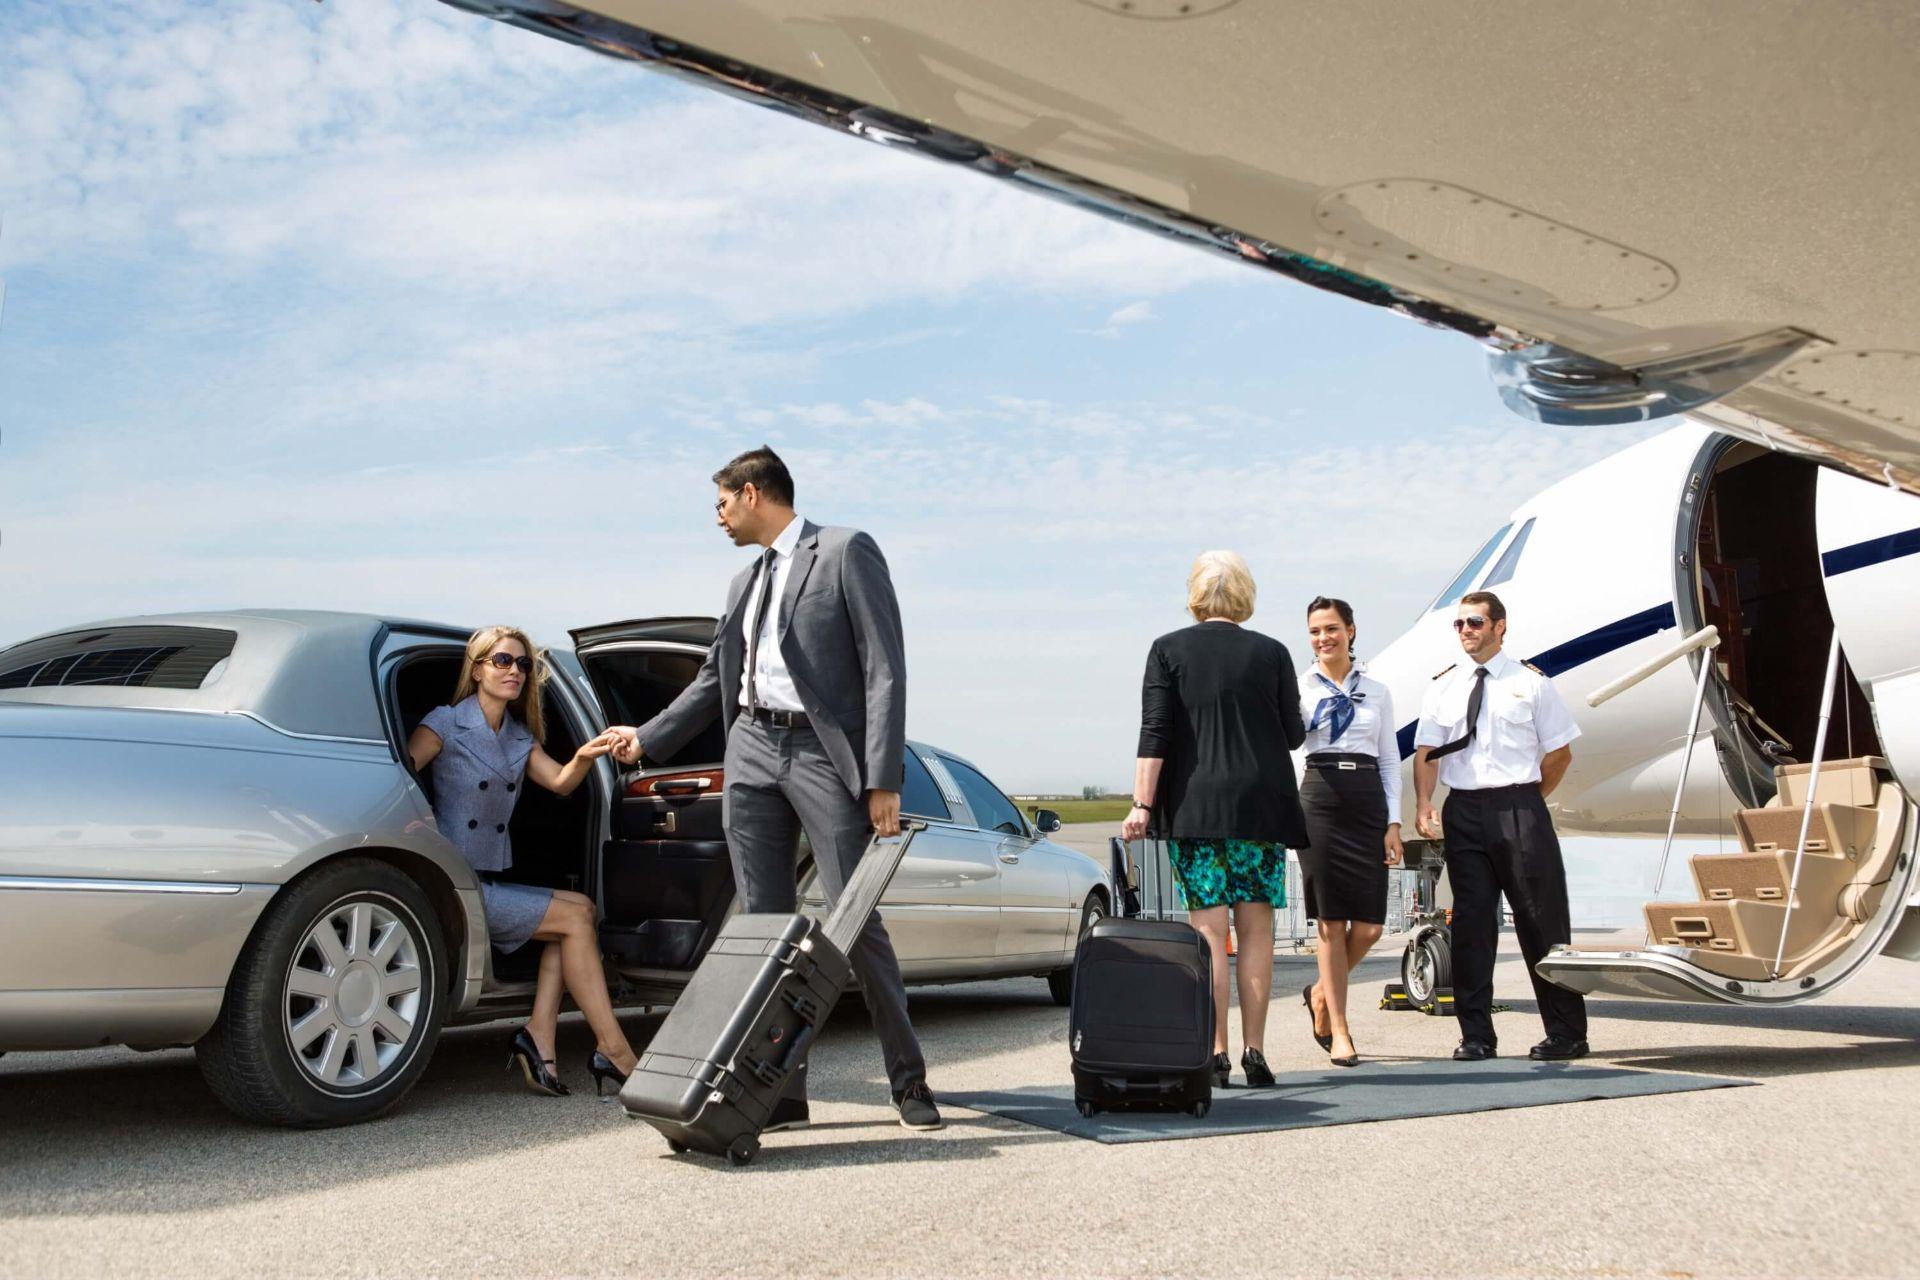 Экипаж бизнес самолета